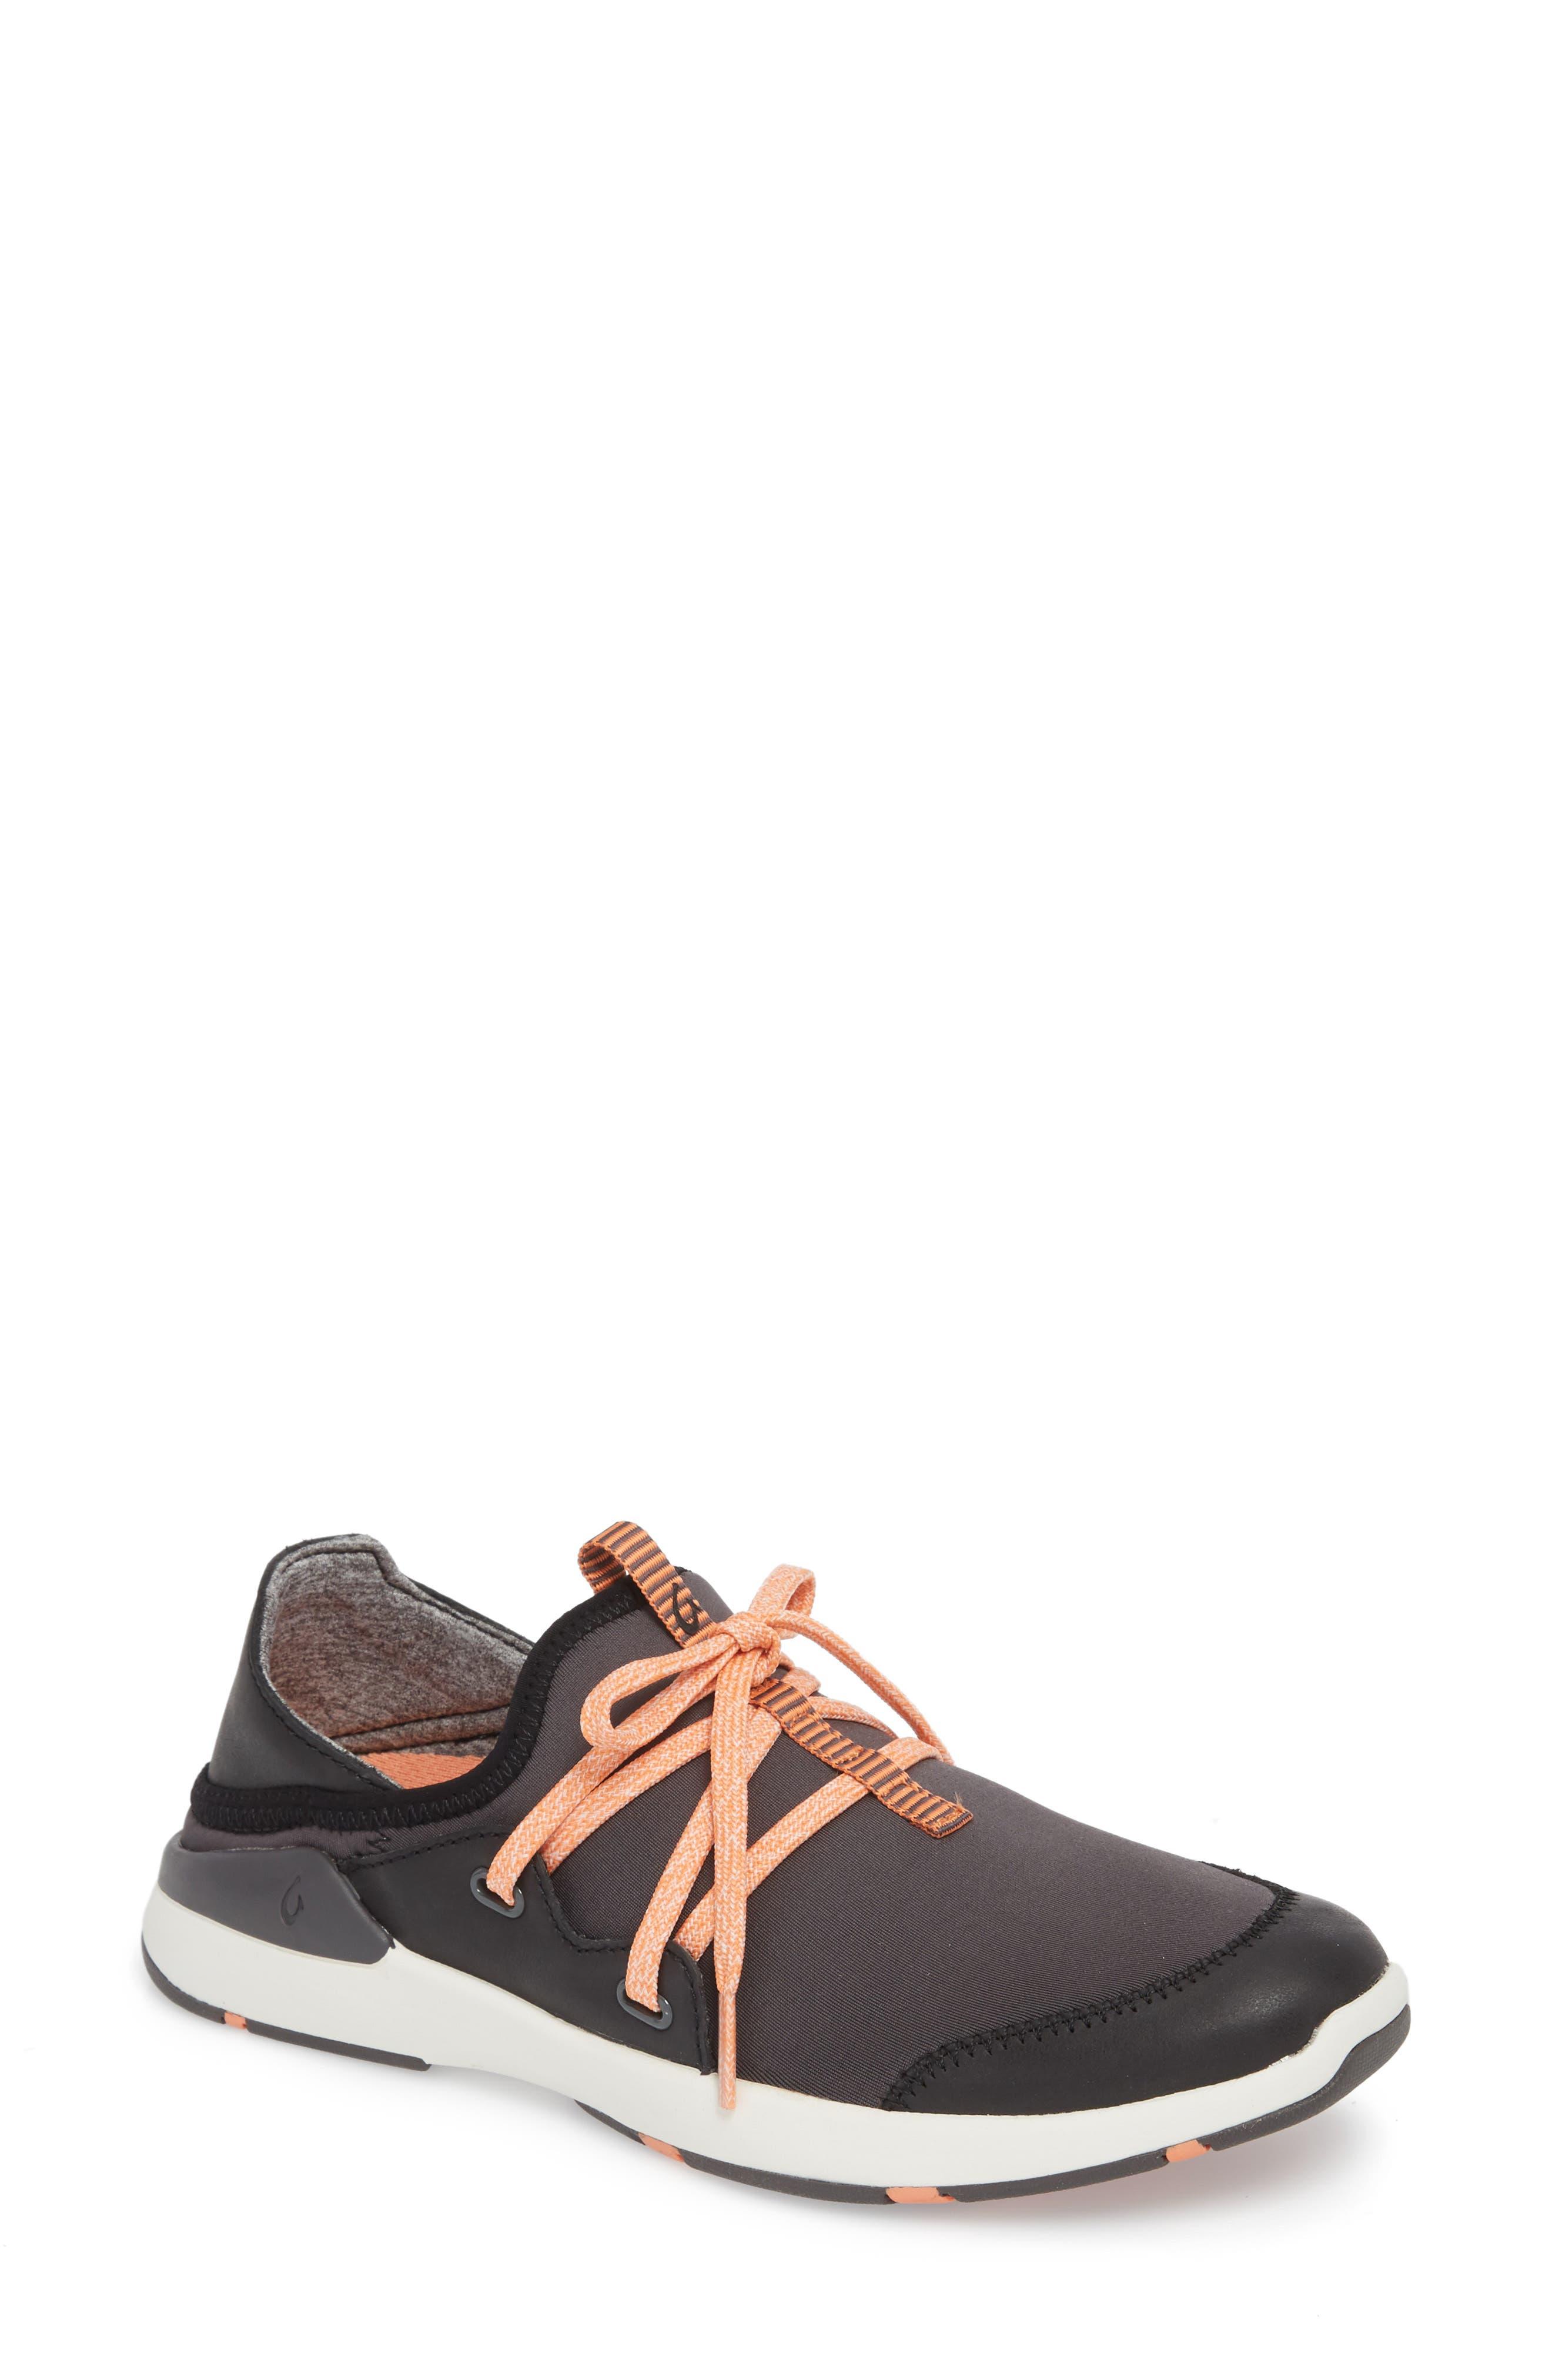 Olukai Miki Li Convertible Sneaker, Black